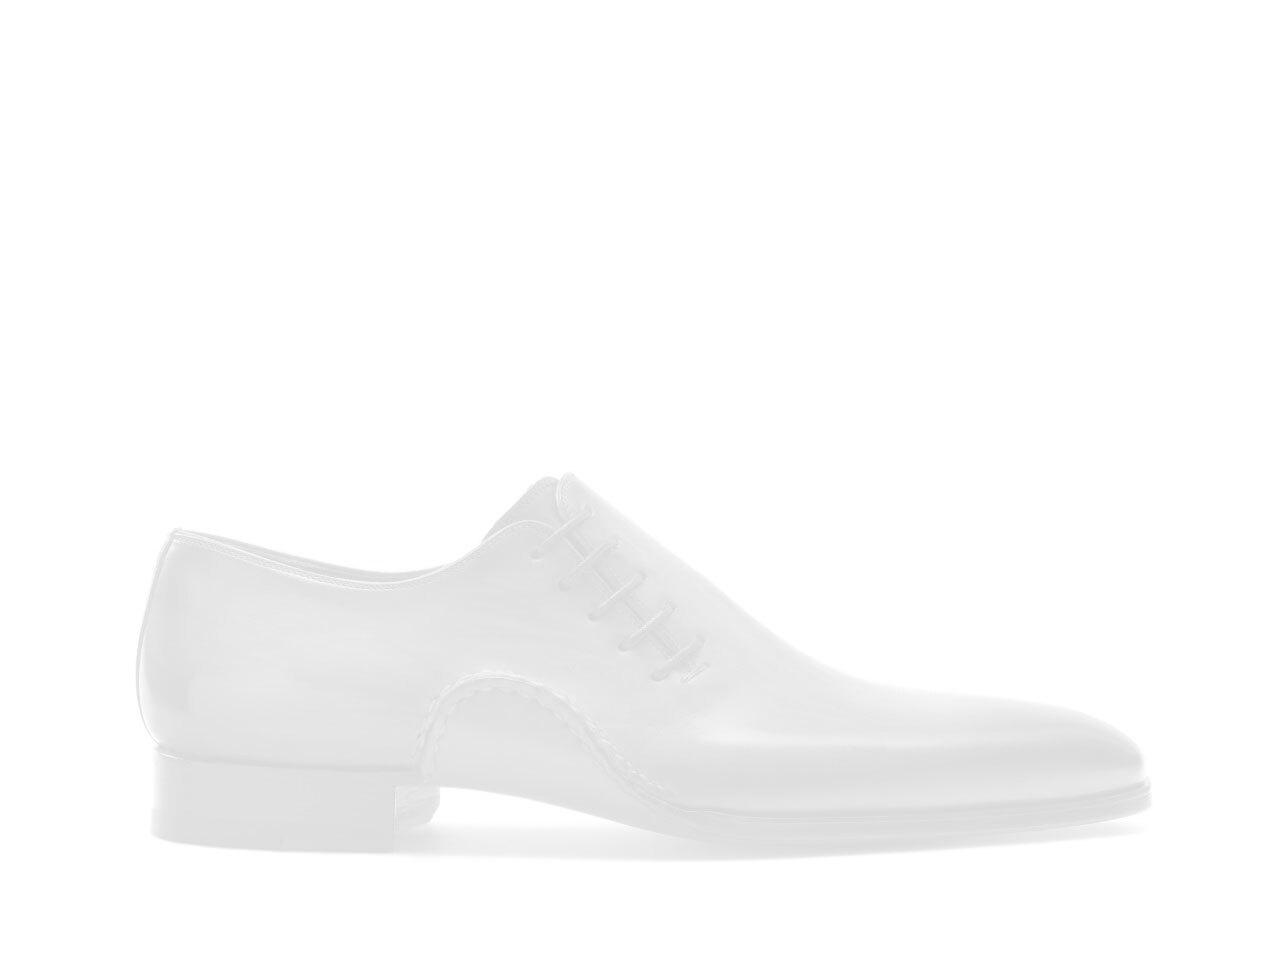 Sole of the Magnanni Spero White Men's Sneakers